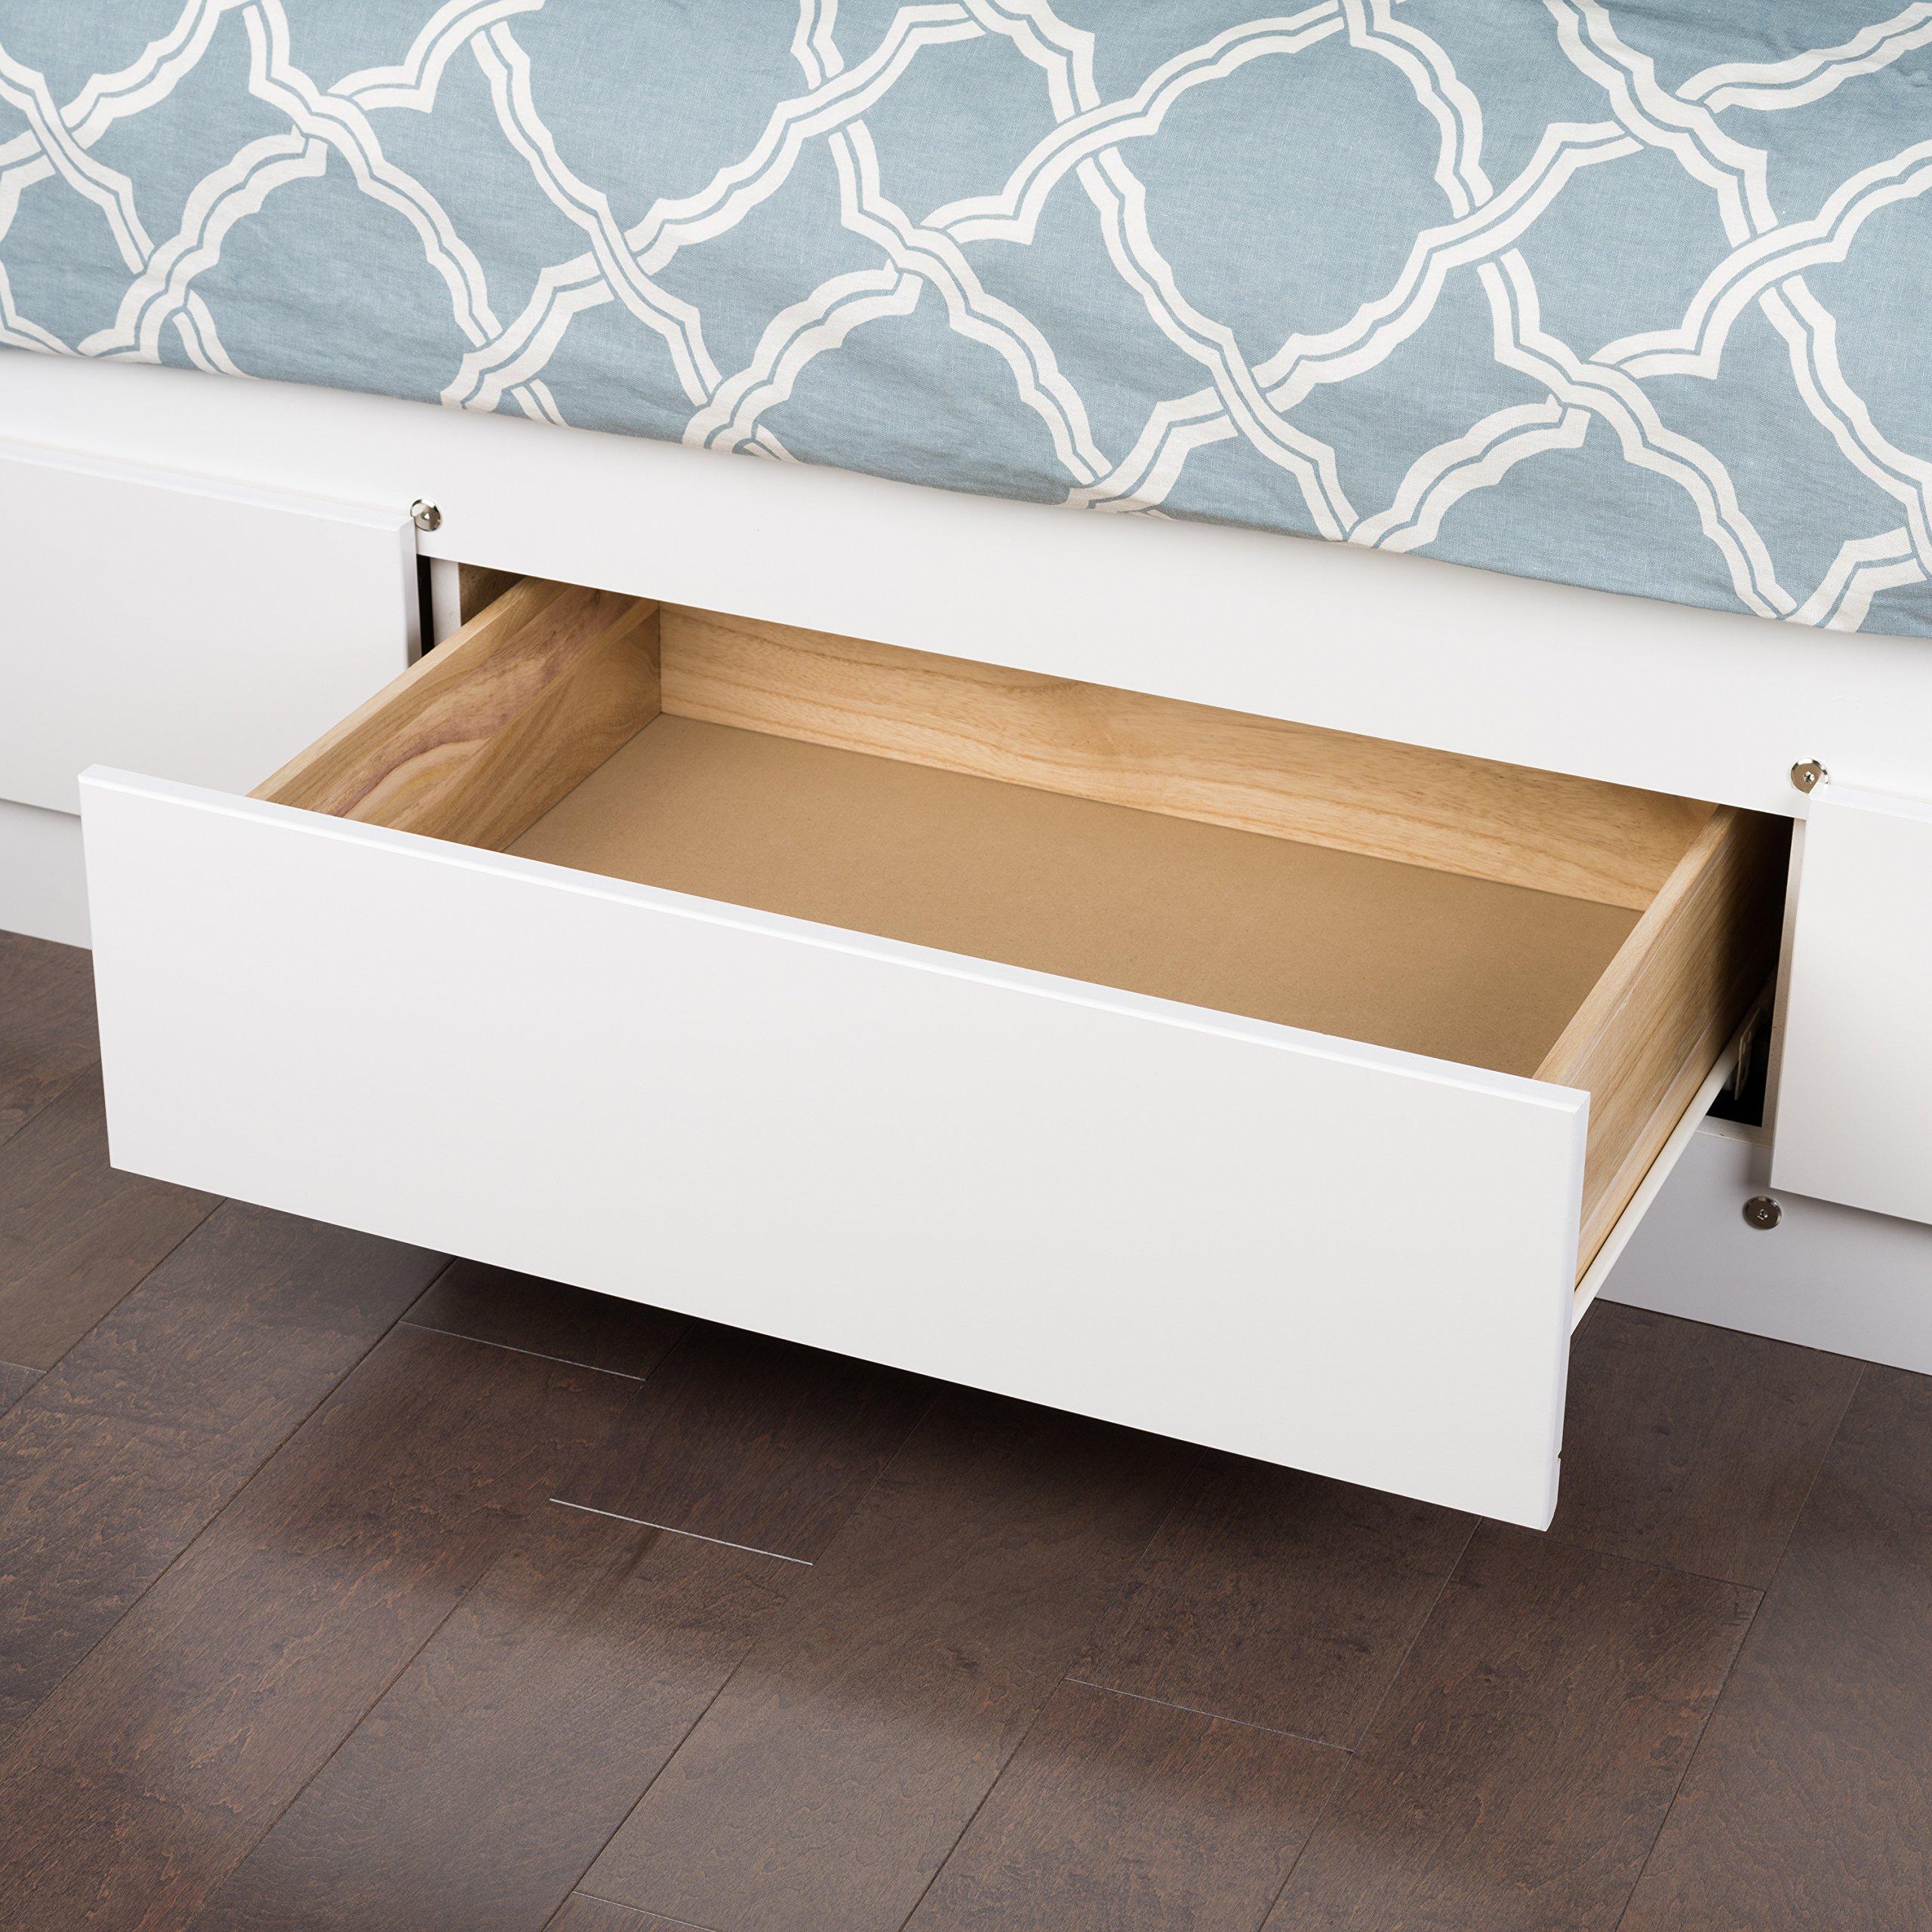 white queen mate s platform storage bed with 6 drawers 772398510910 ebay. Black Bedroom Furniture Sets. Home Design Ideas